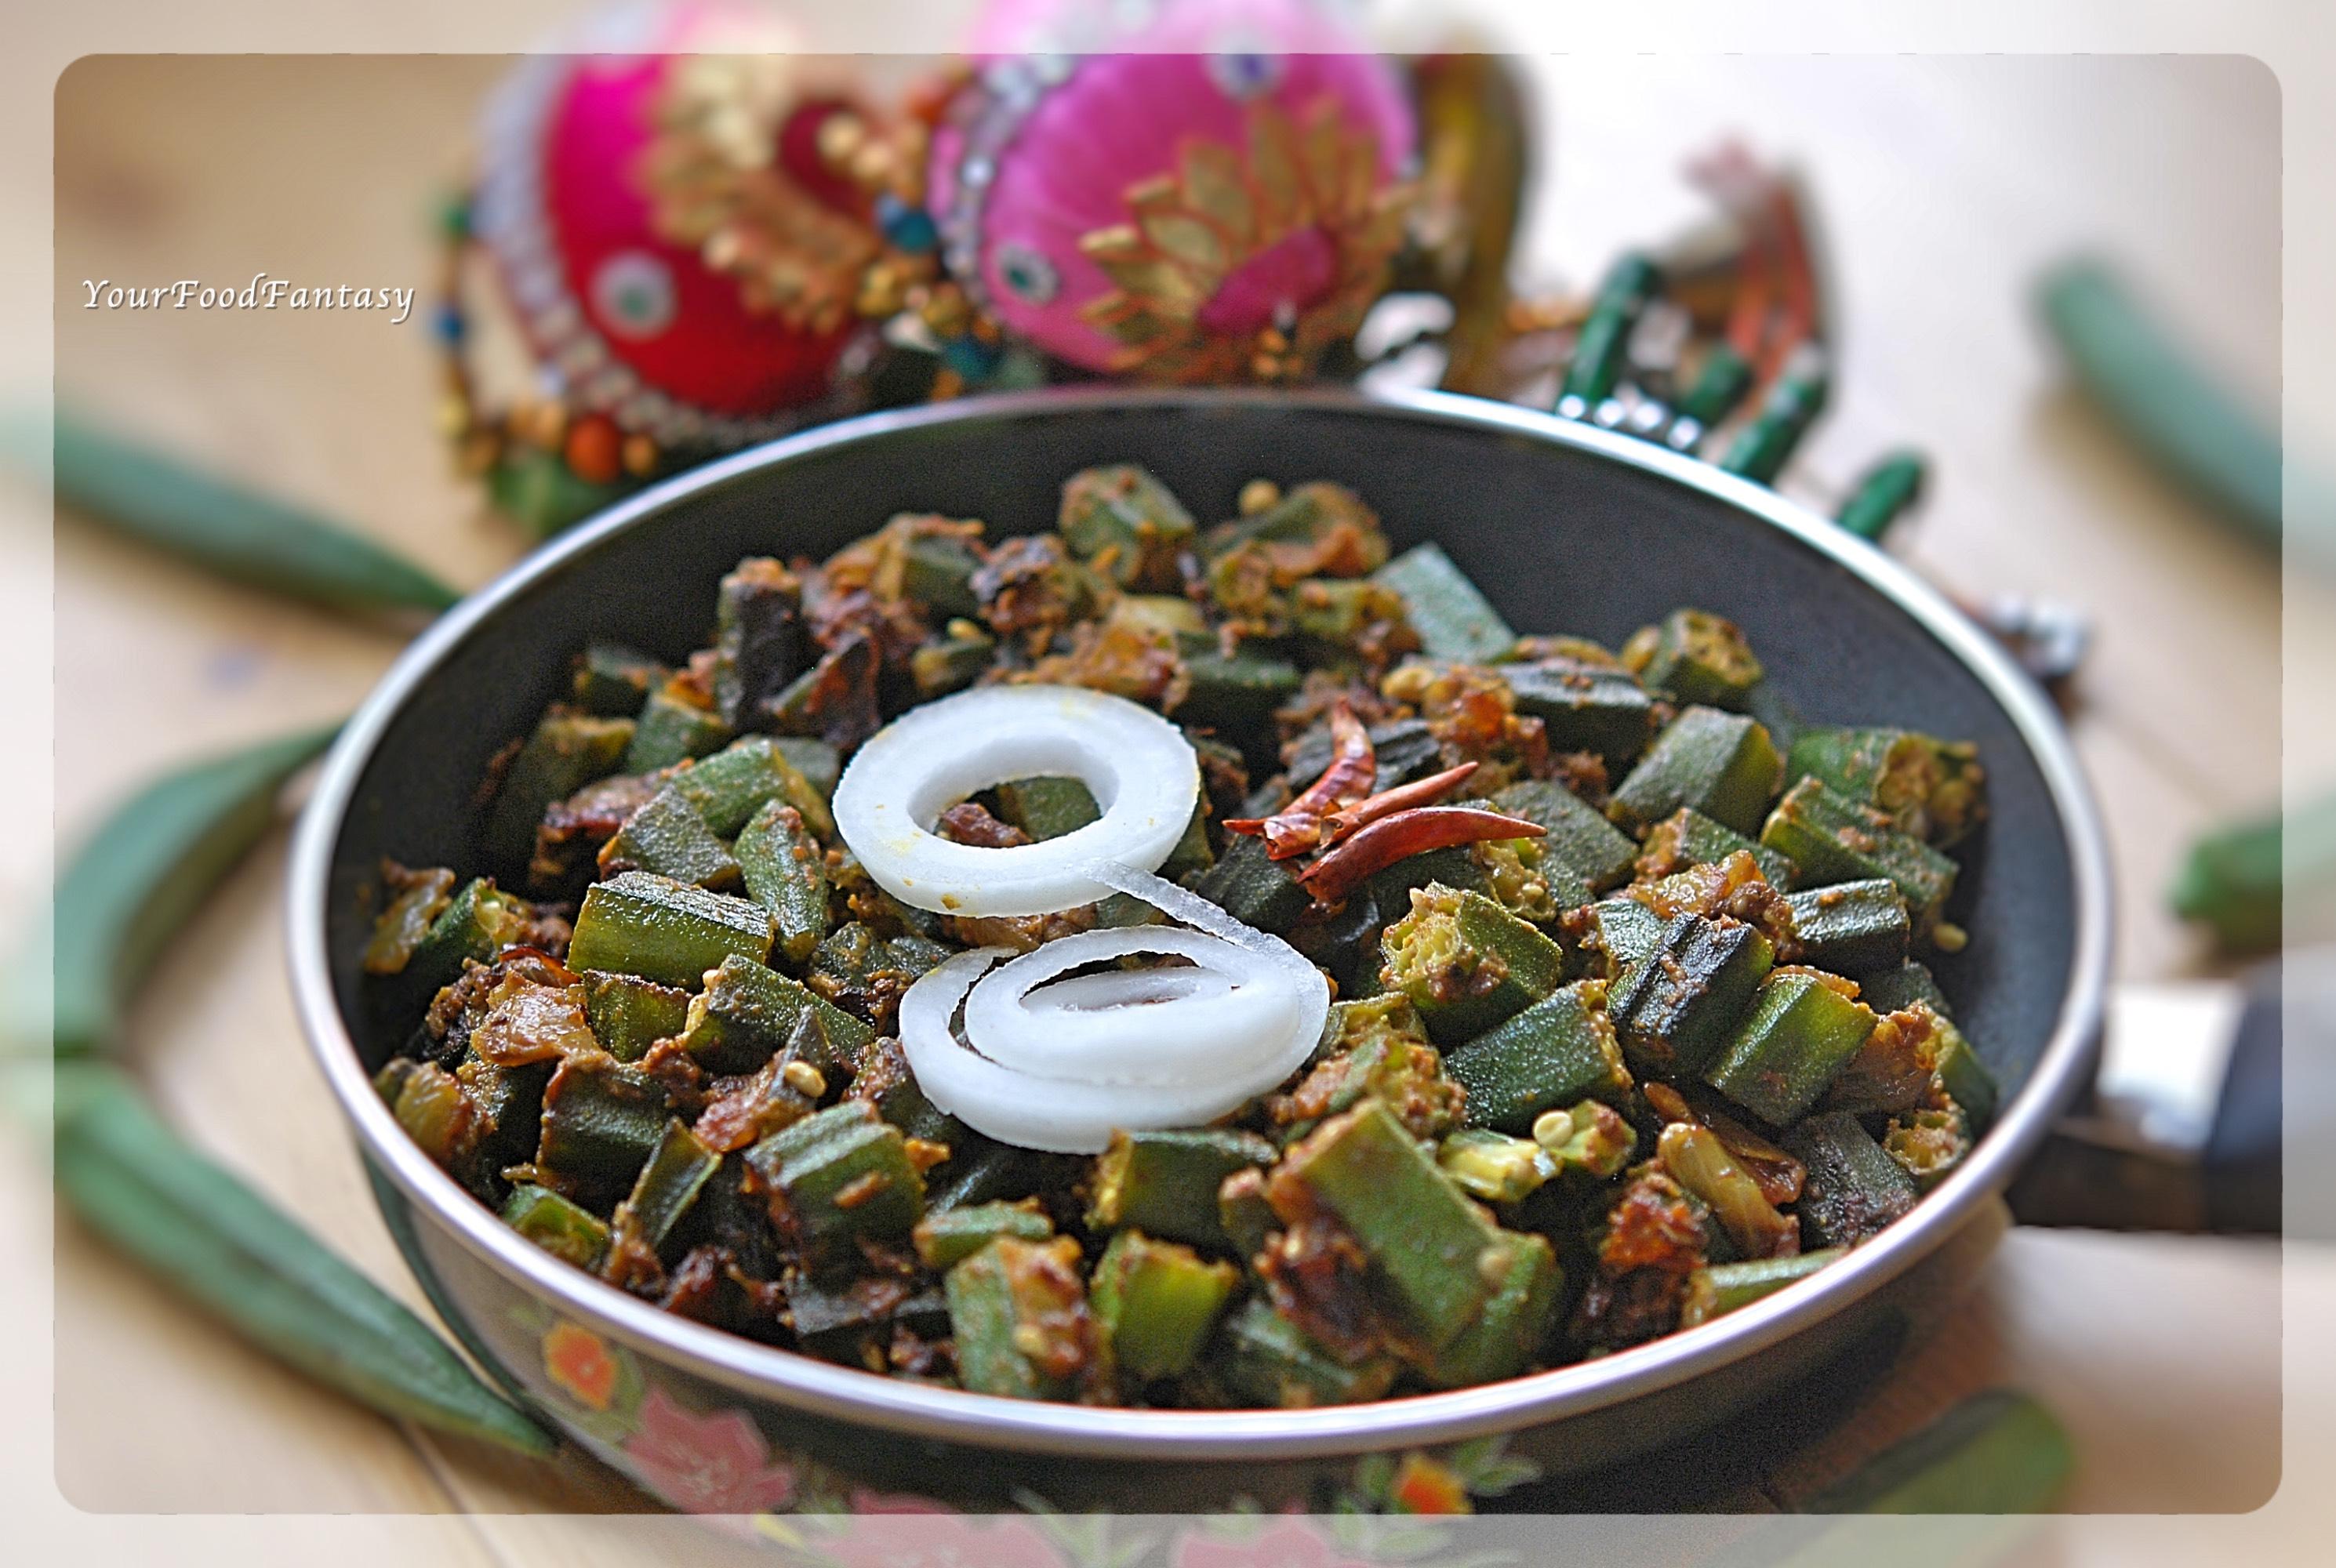 Dry Bhindi Masala Recipe | YourFoodFantasy.com by Meenu Gupta